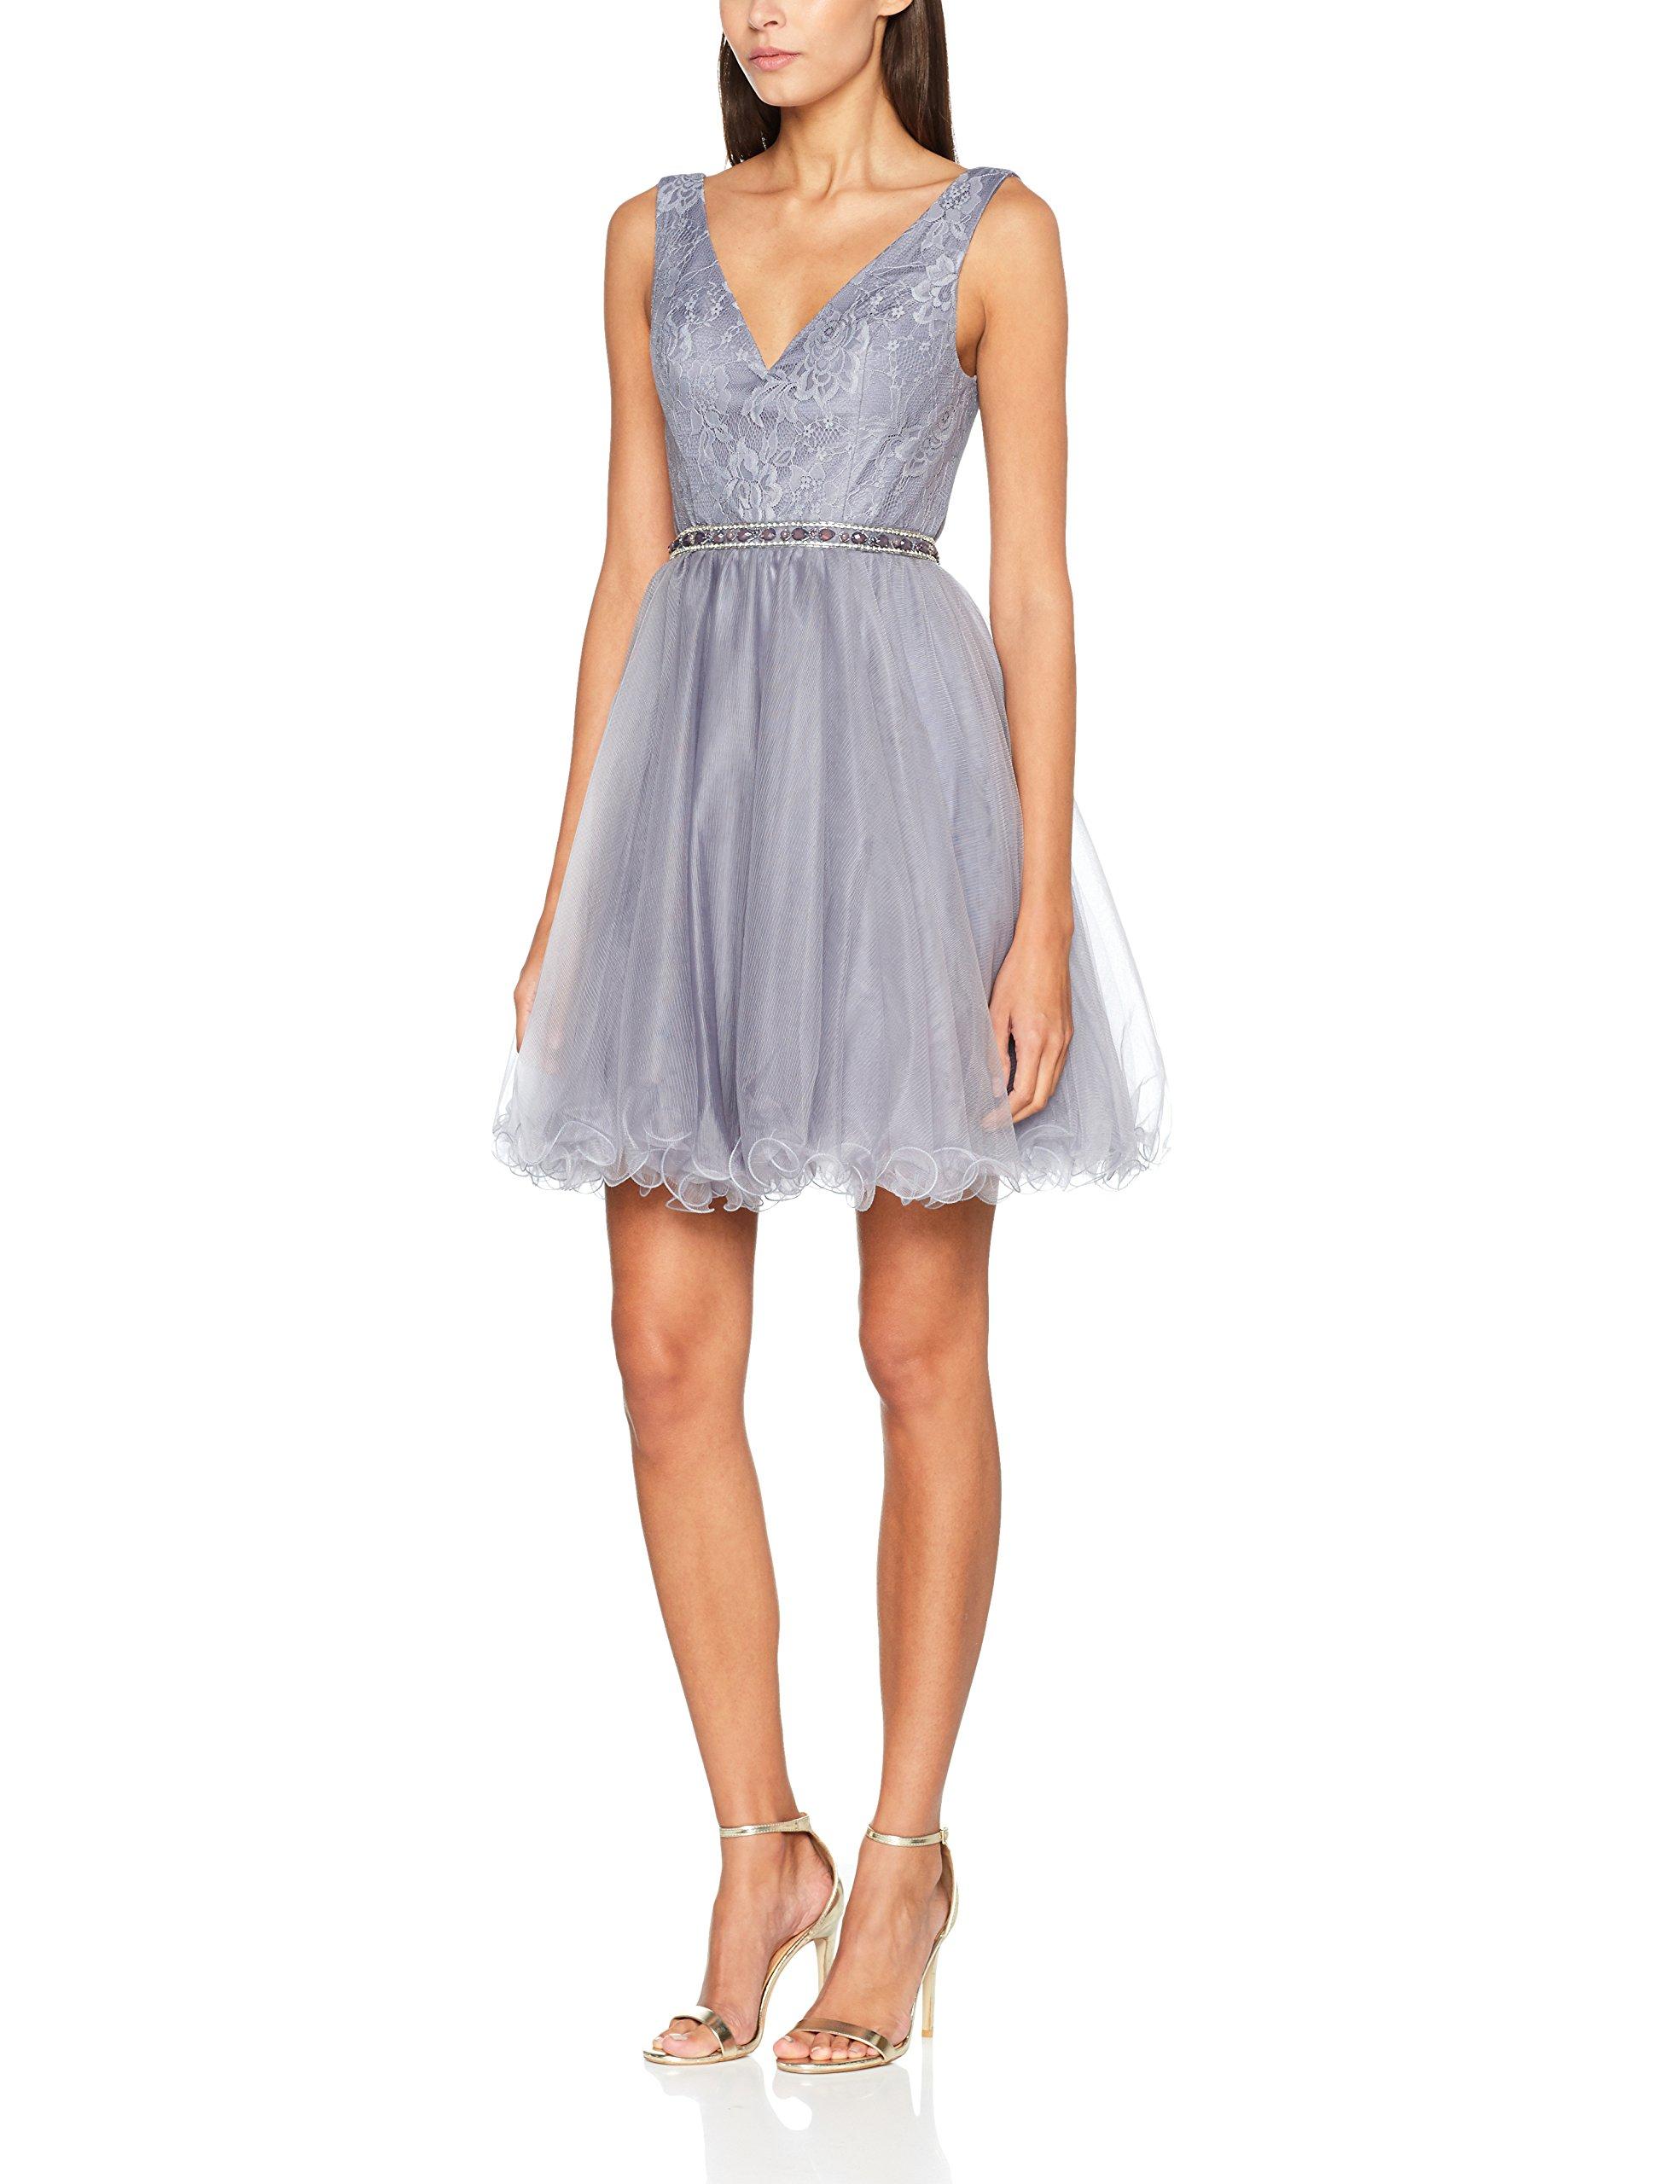 Cocktail Femme Laona Lilac 6 9045Uk RobeViolettsoft Dress WYD9EeIH2